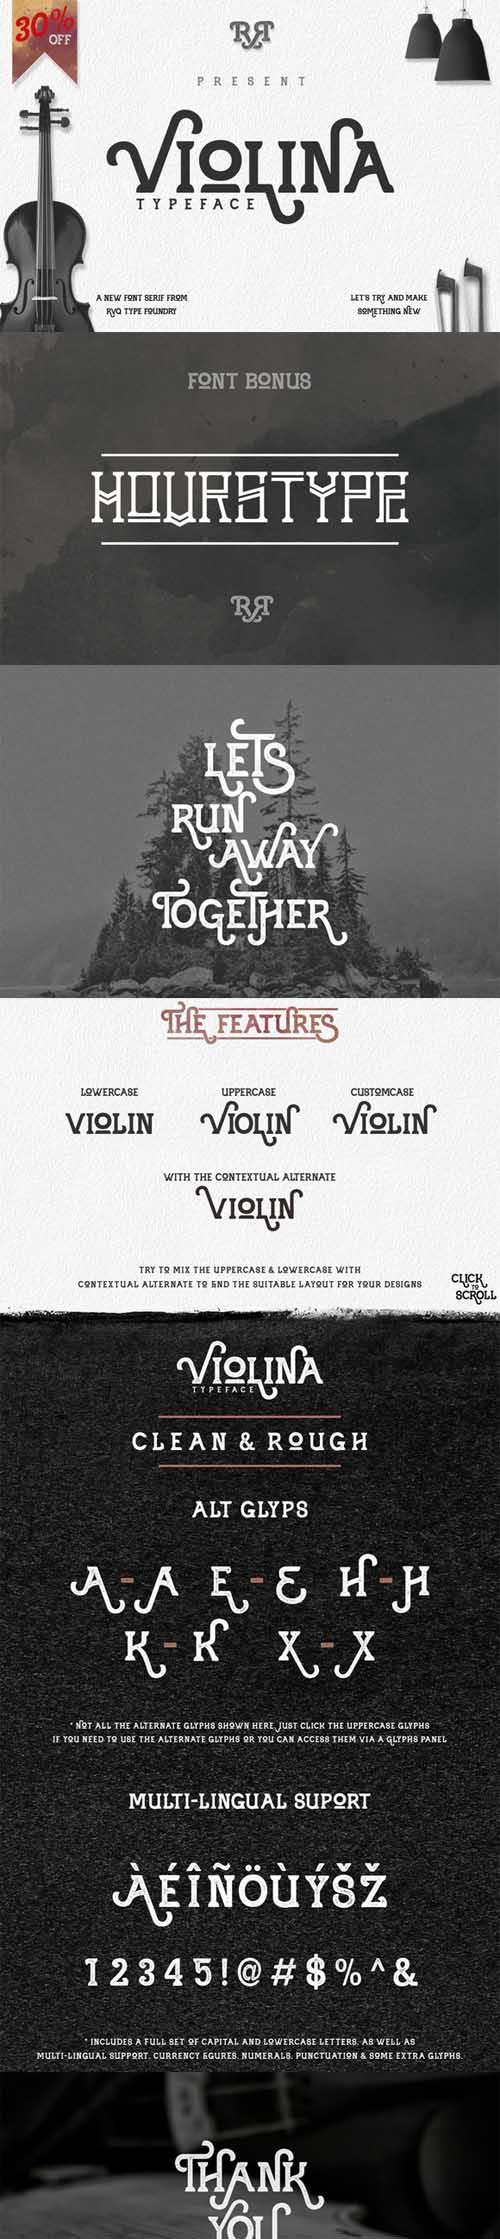 Violina Typeface Font